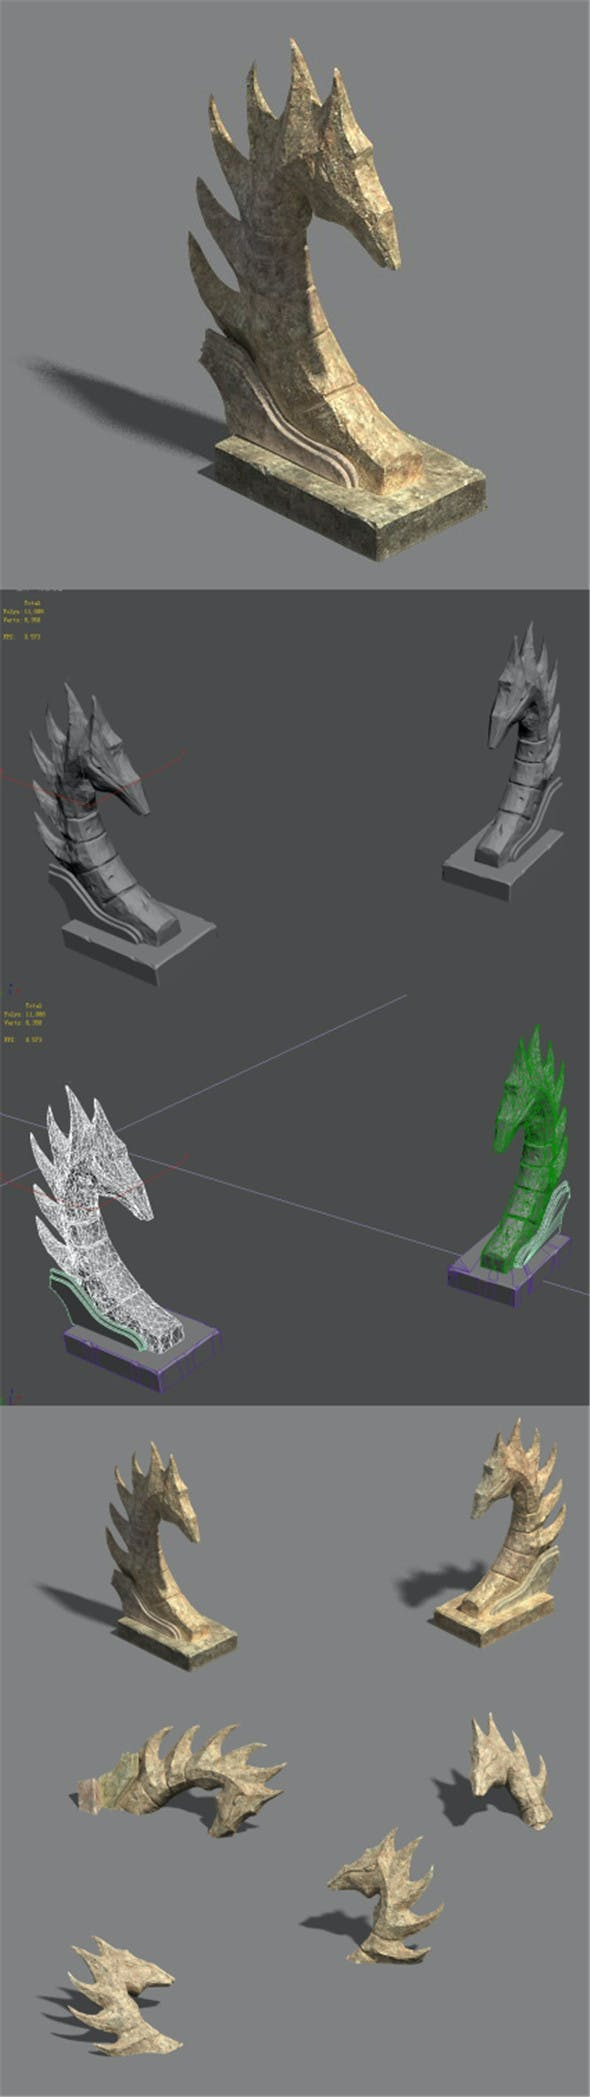 Desert - stone dragon guardian beast 02 - 3DOcean Item for Sale